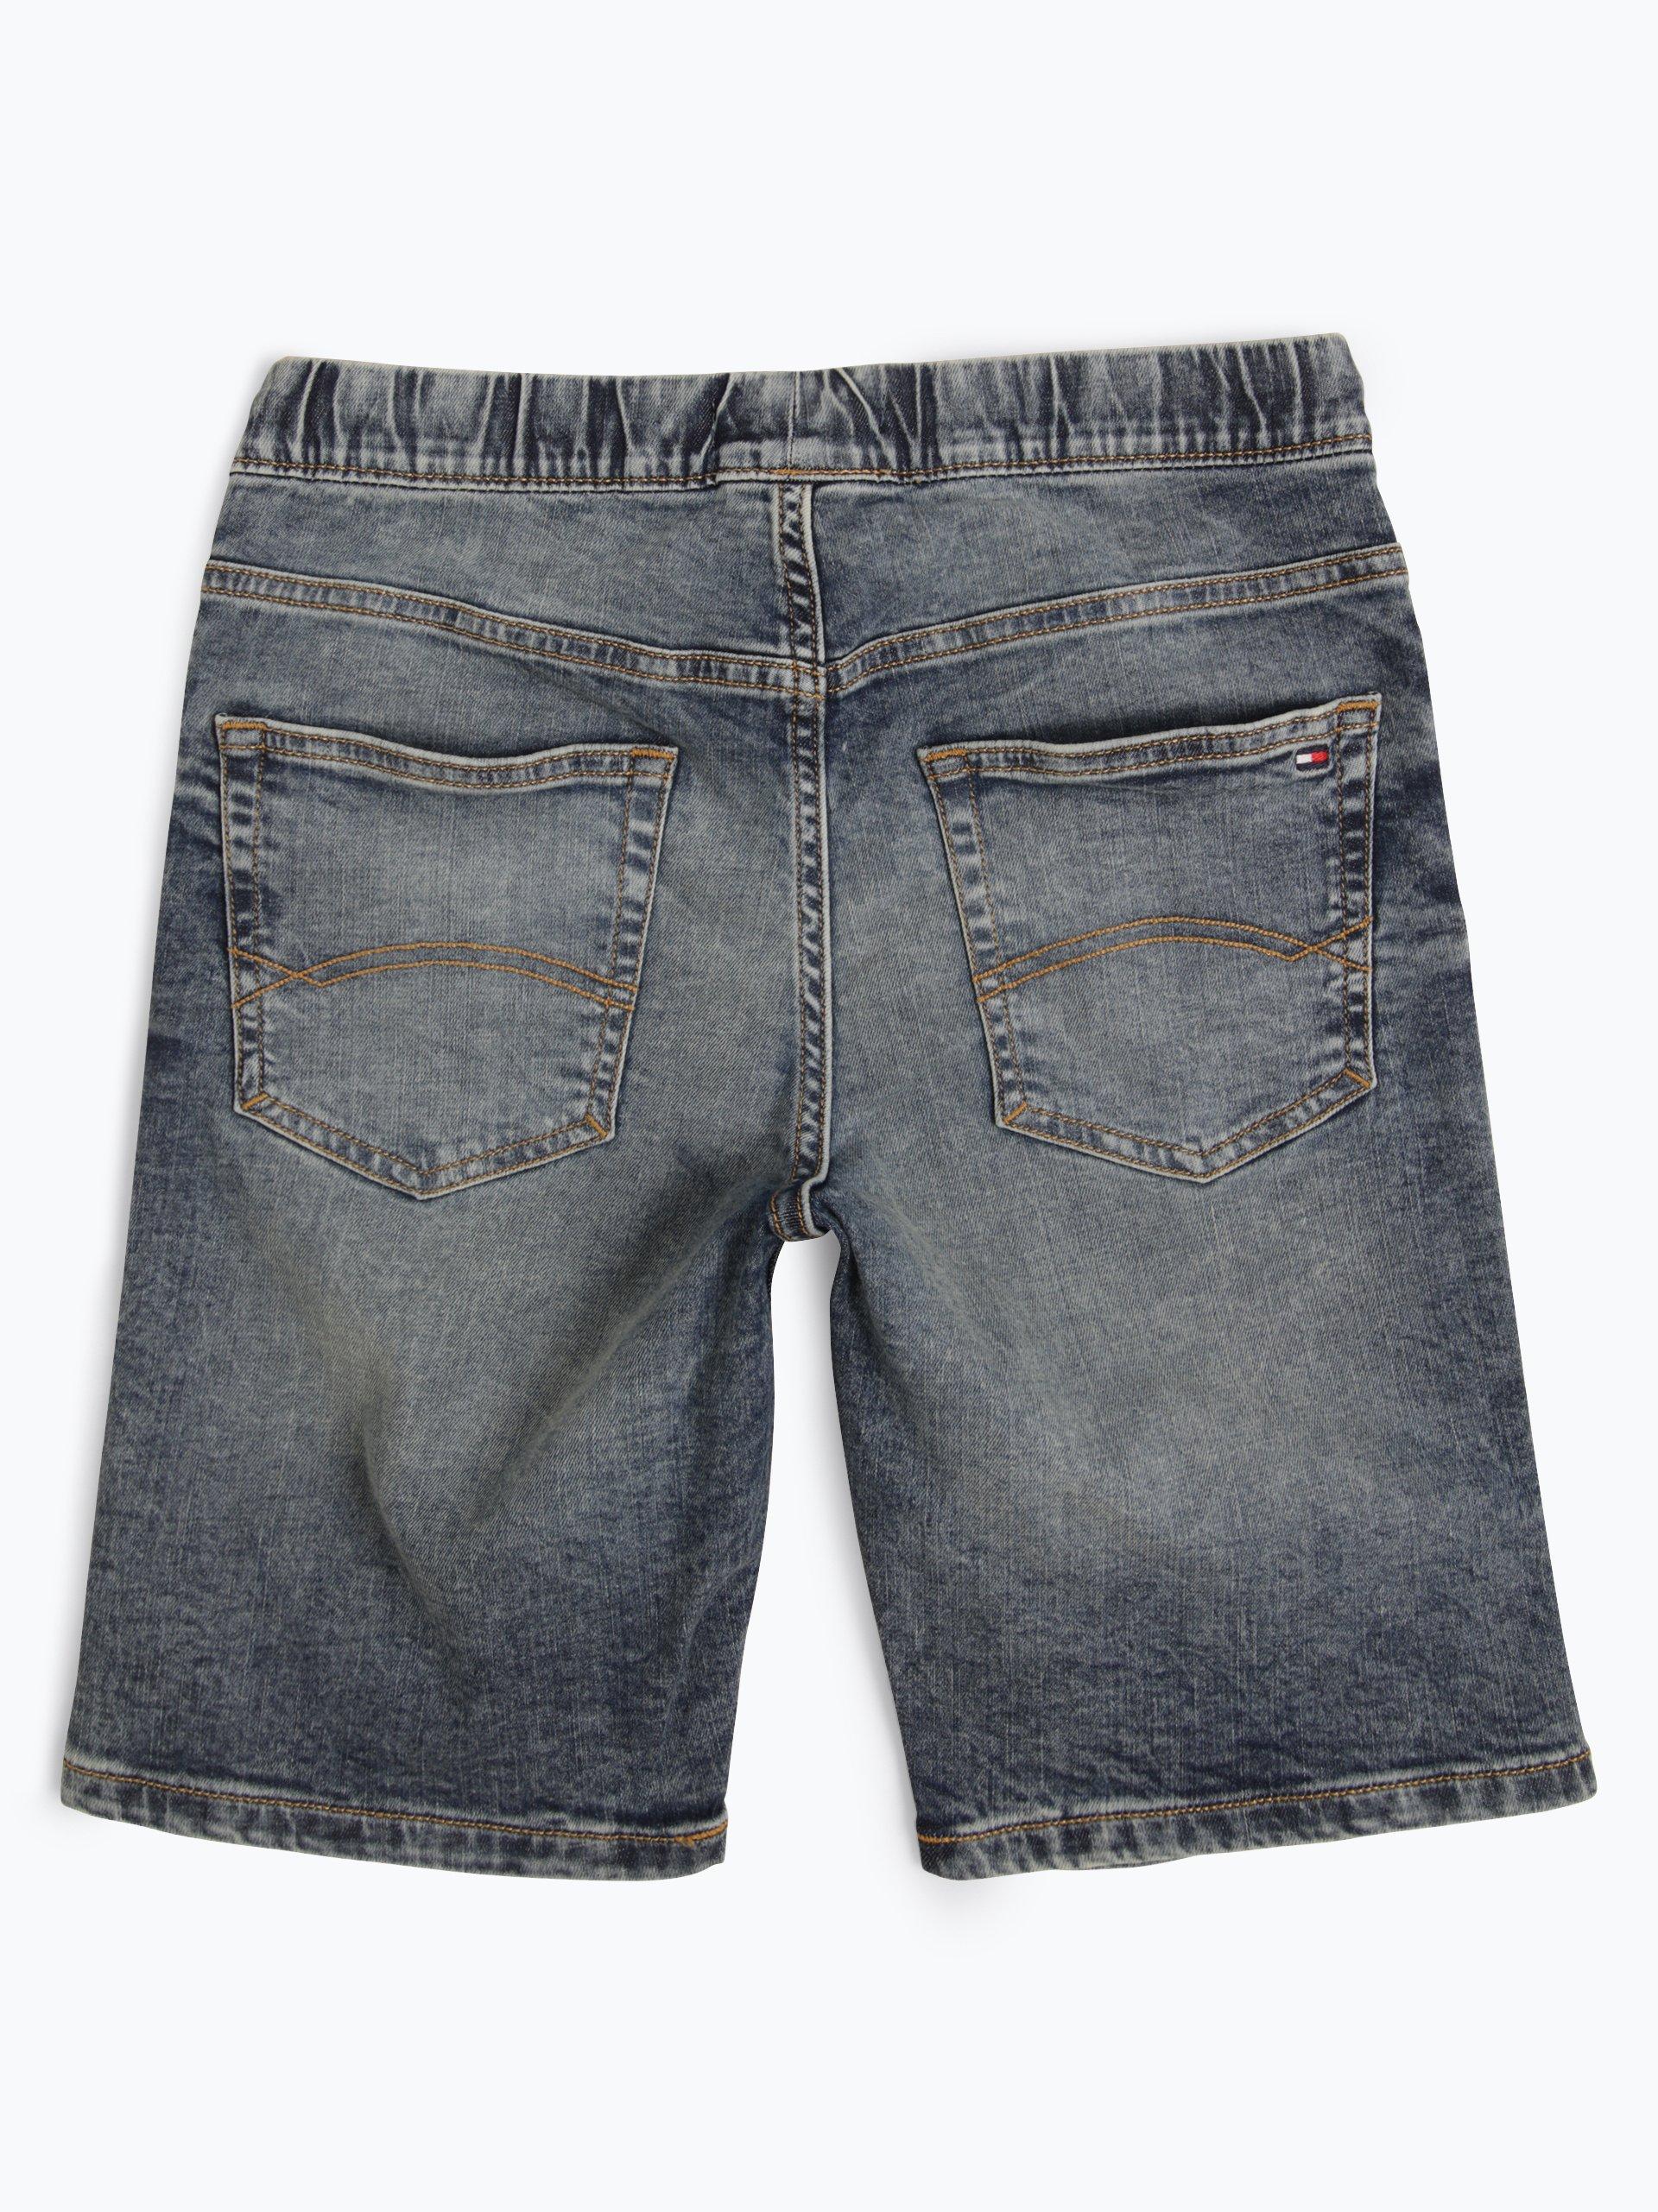 Tommy Hilfiger Jungen Jeansshorts